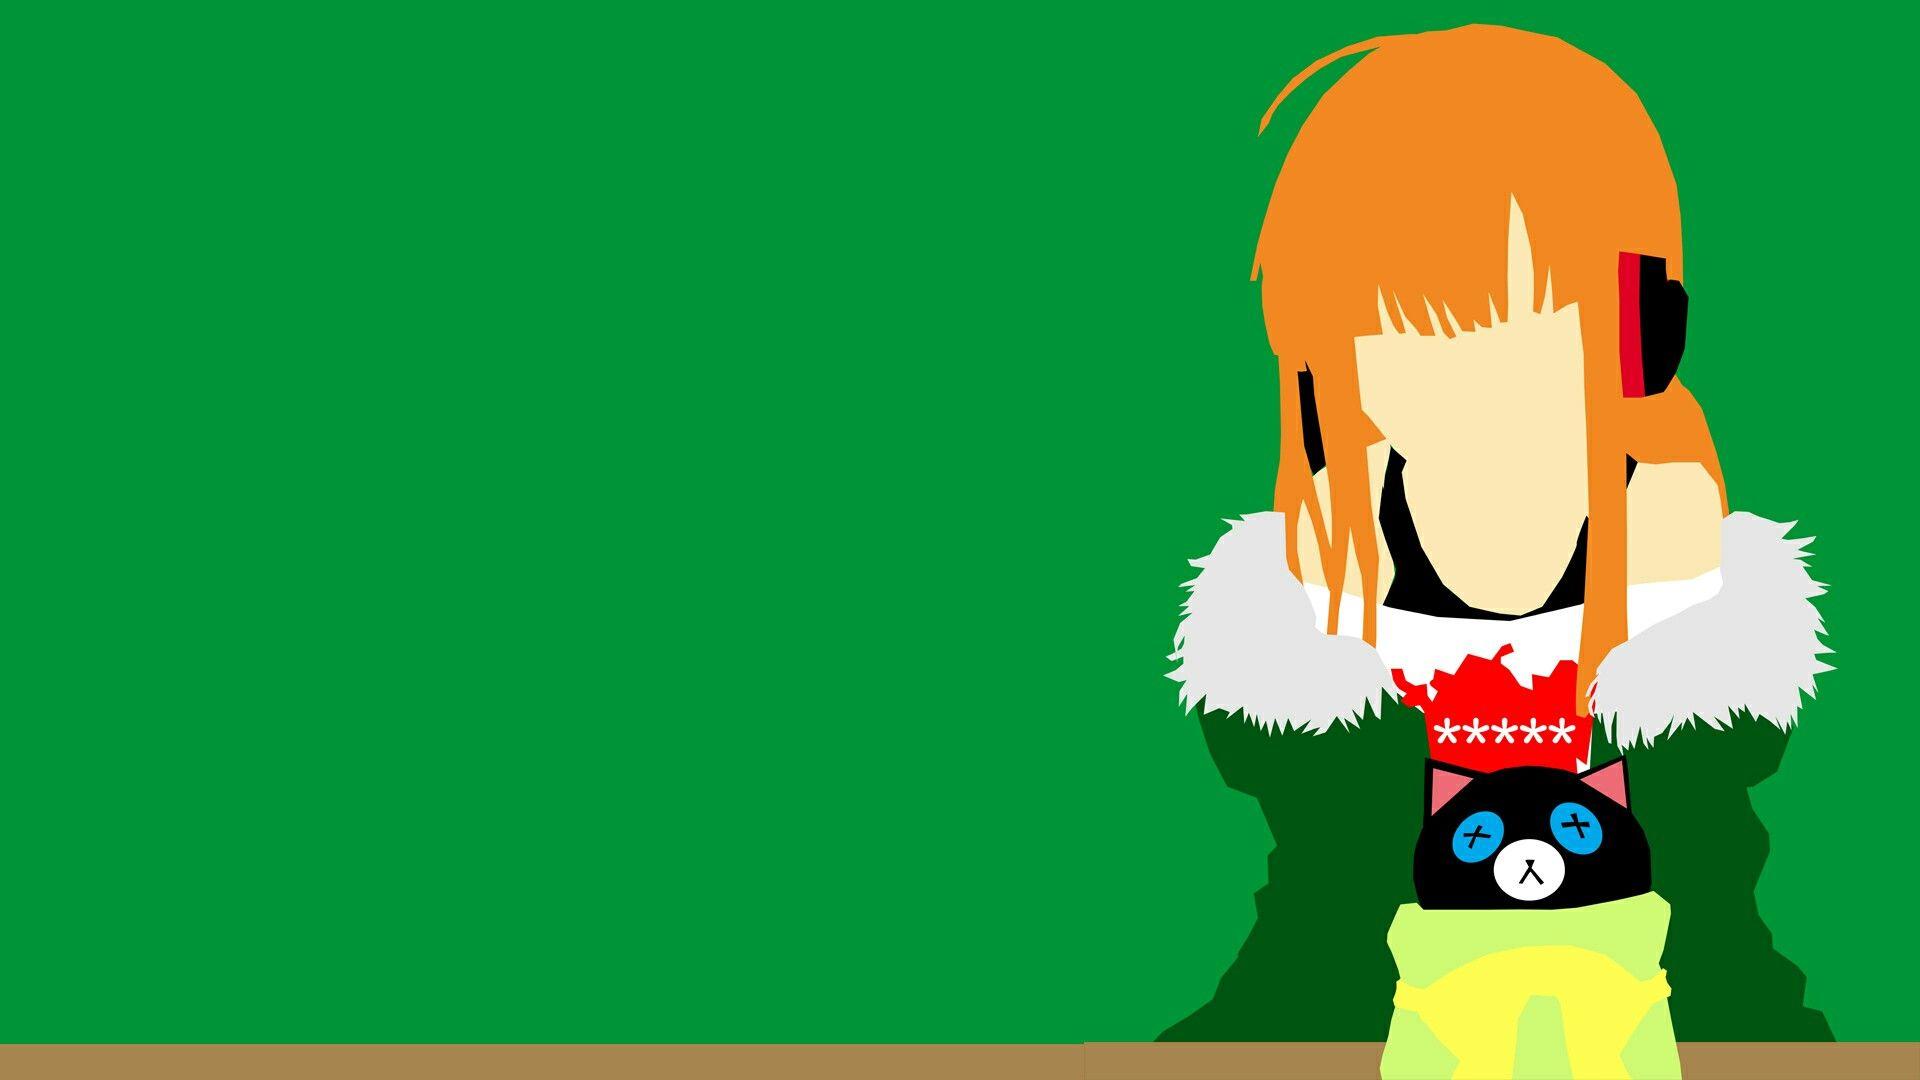 Futaba Sakura From Persona 5 Desktop Wallpaper Vector Artwork Persona 5 Wallpaper